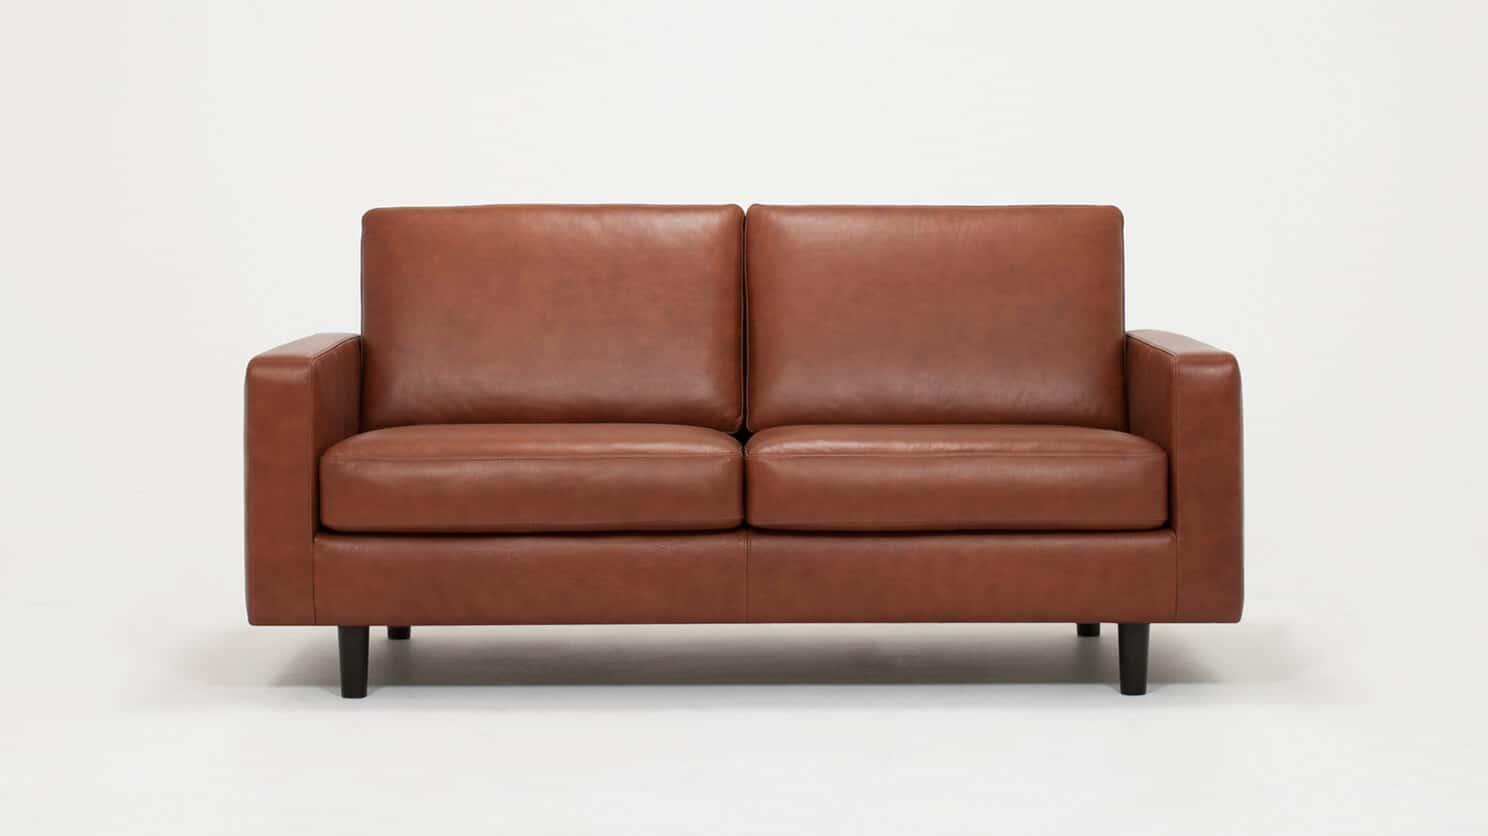 37116 03 01 loveseat oskar leather front view